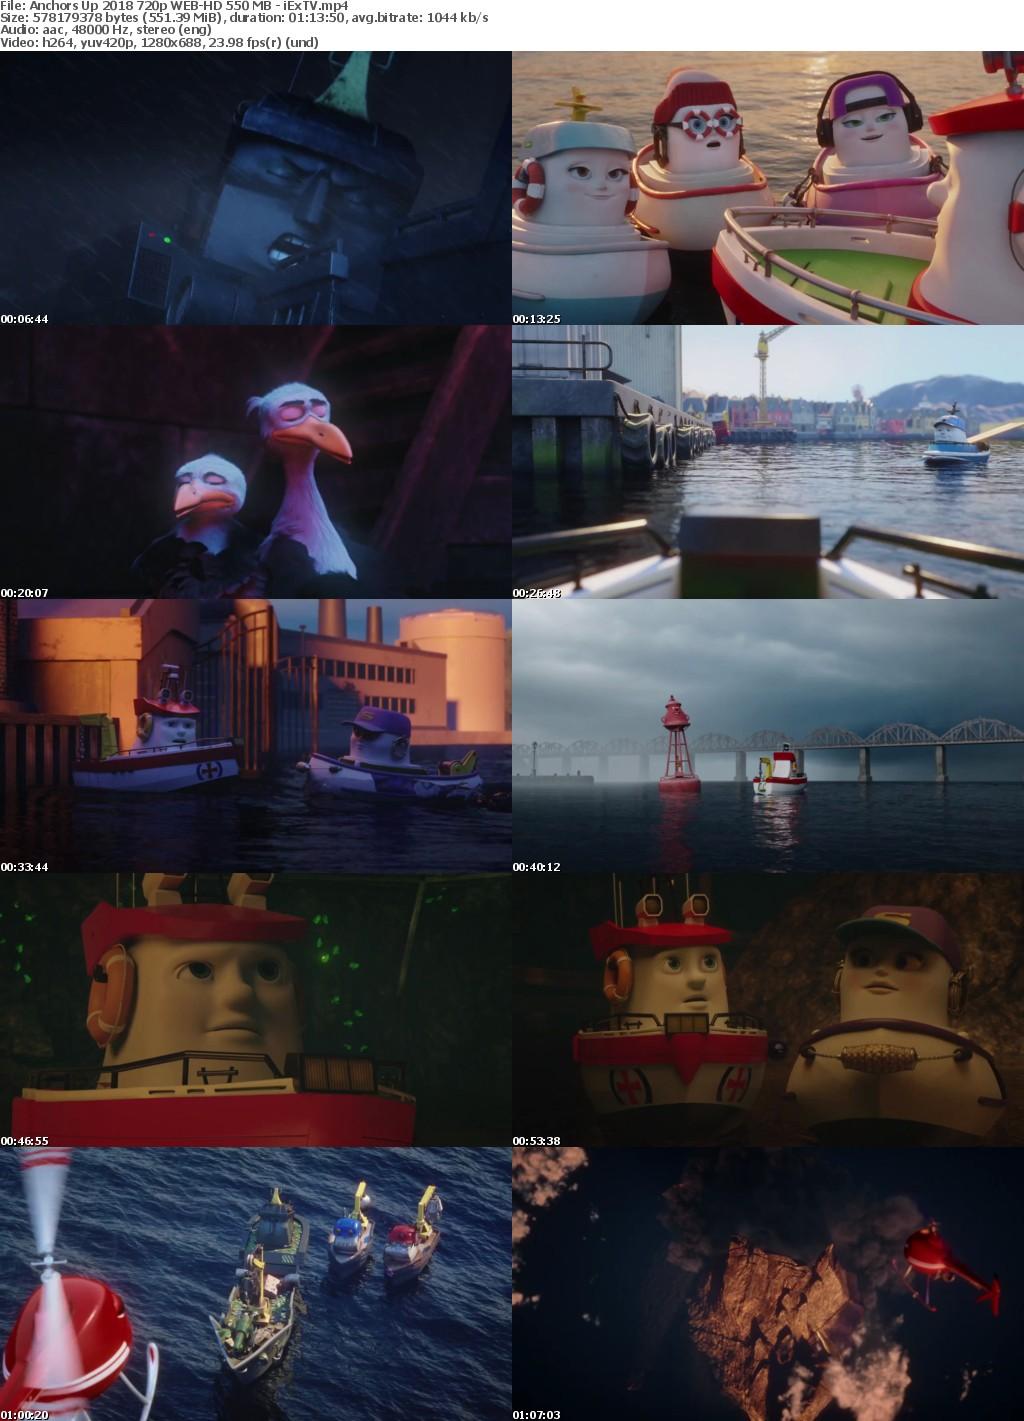 Anchors Up (2018) 720p WEB-HD 550 MB - iExTV